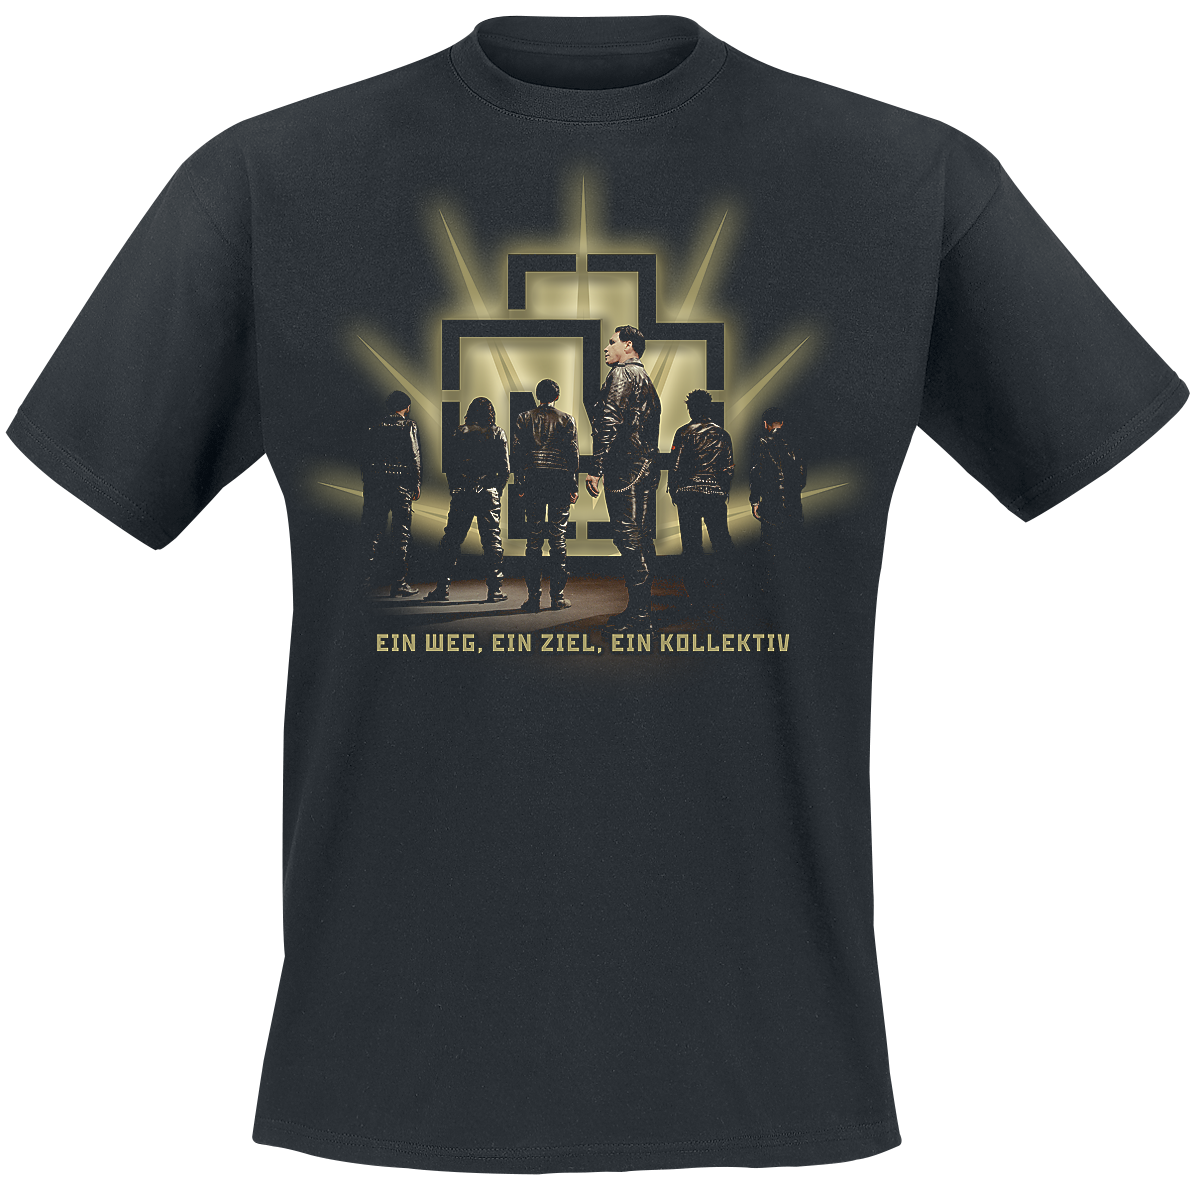 Rammstein - Kollektiv - T-Shirt - black image